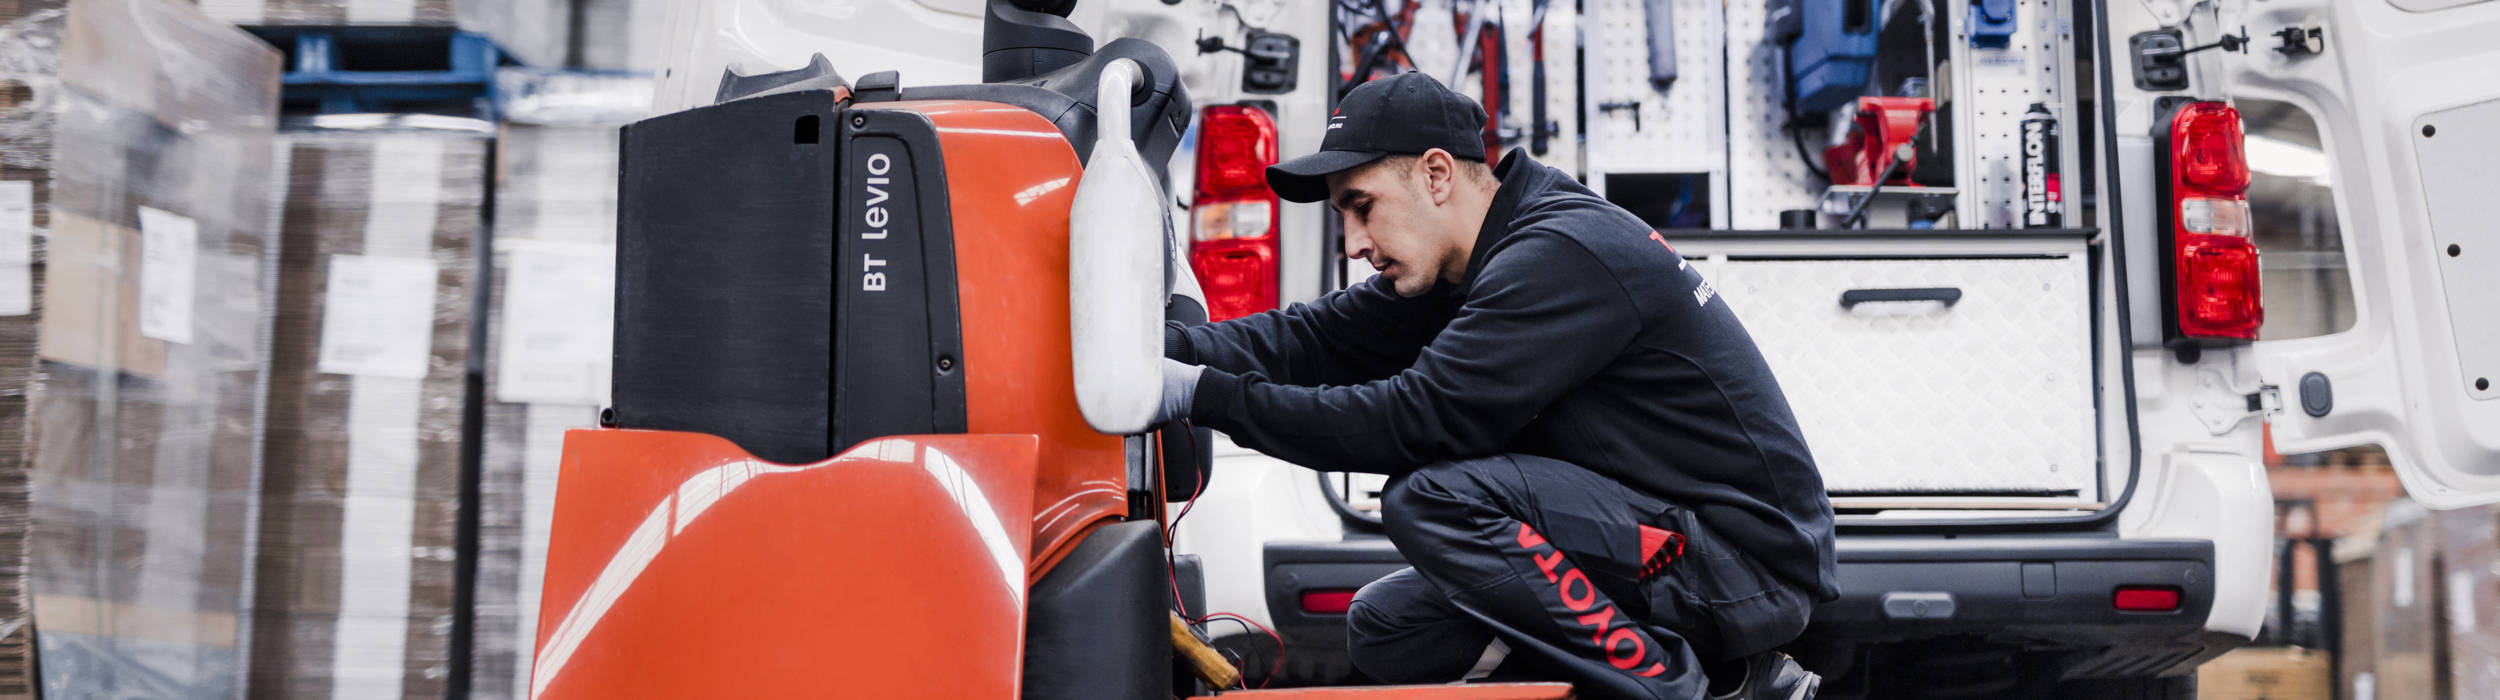 technician servicing a truck